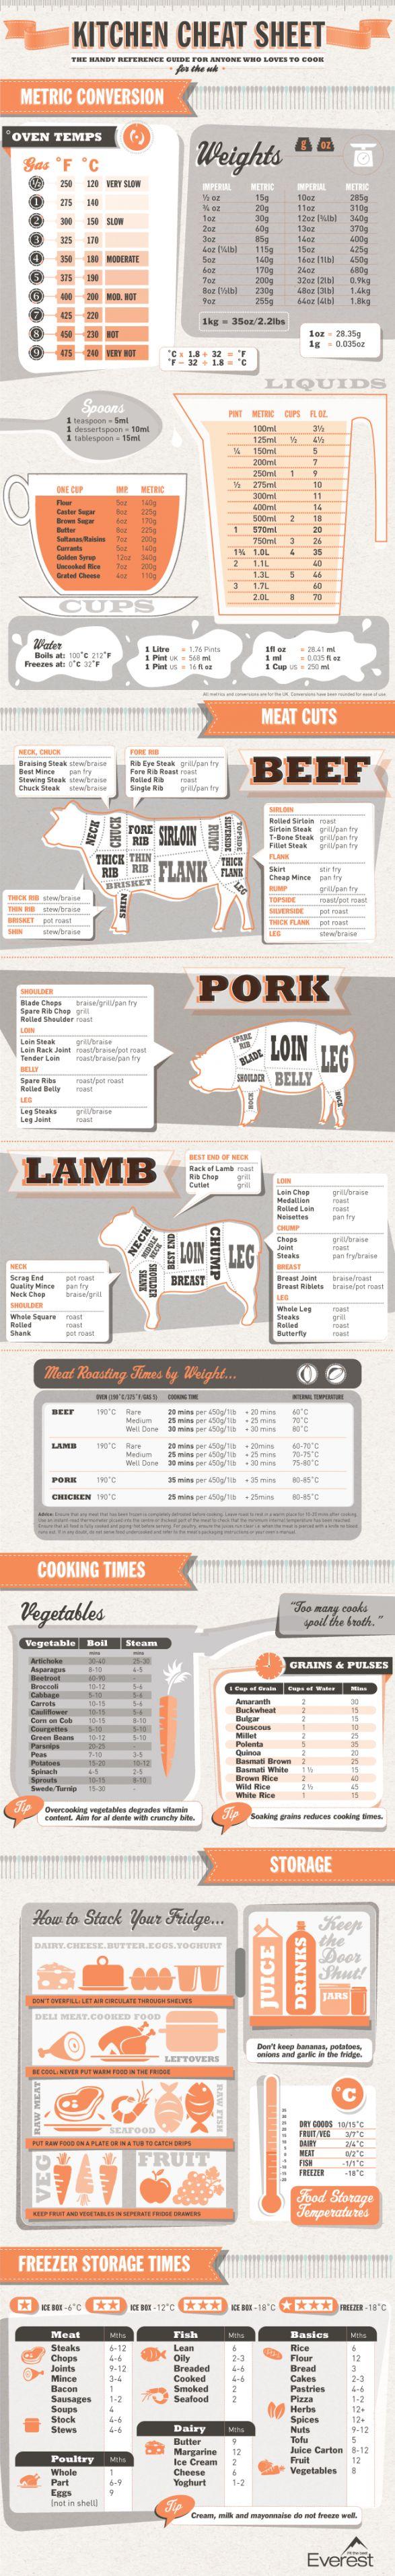 Kitchen Cheat Sheet measuements, terms. food, recipe help